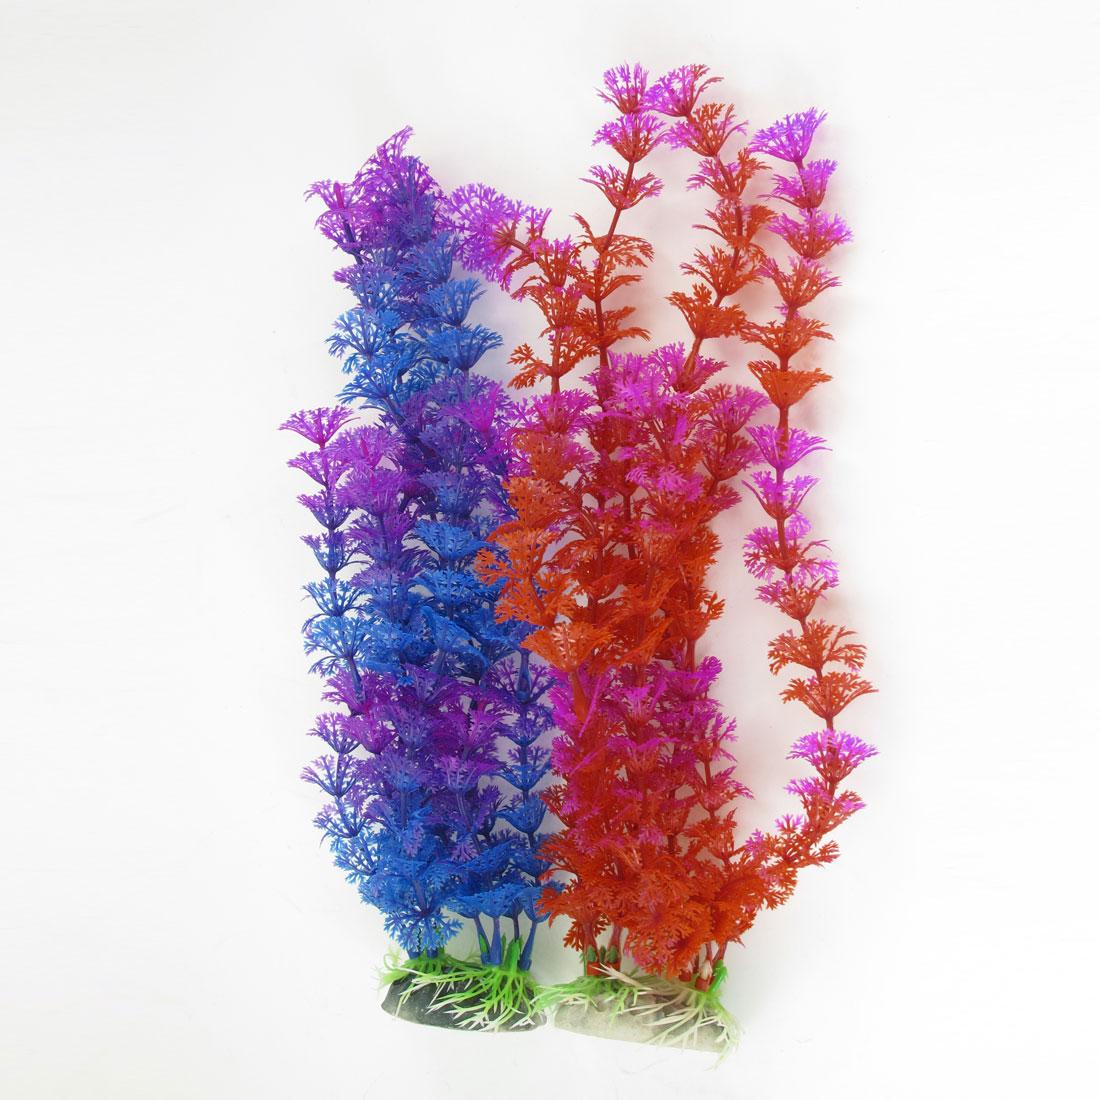 "2 Pcs Violet Red Blue Emulational Fish Tank Aquarium Grasses Decor 11.8"" High"